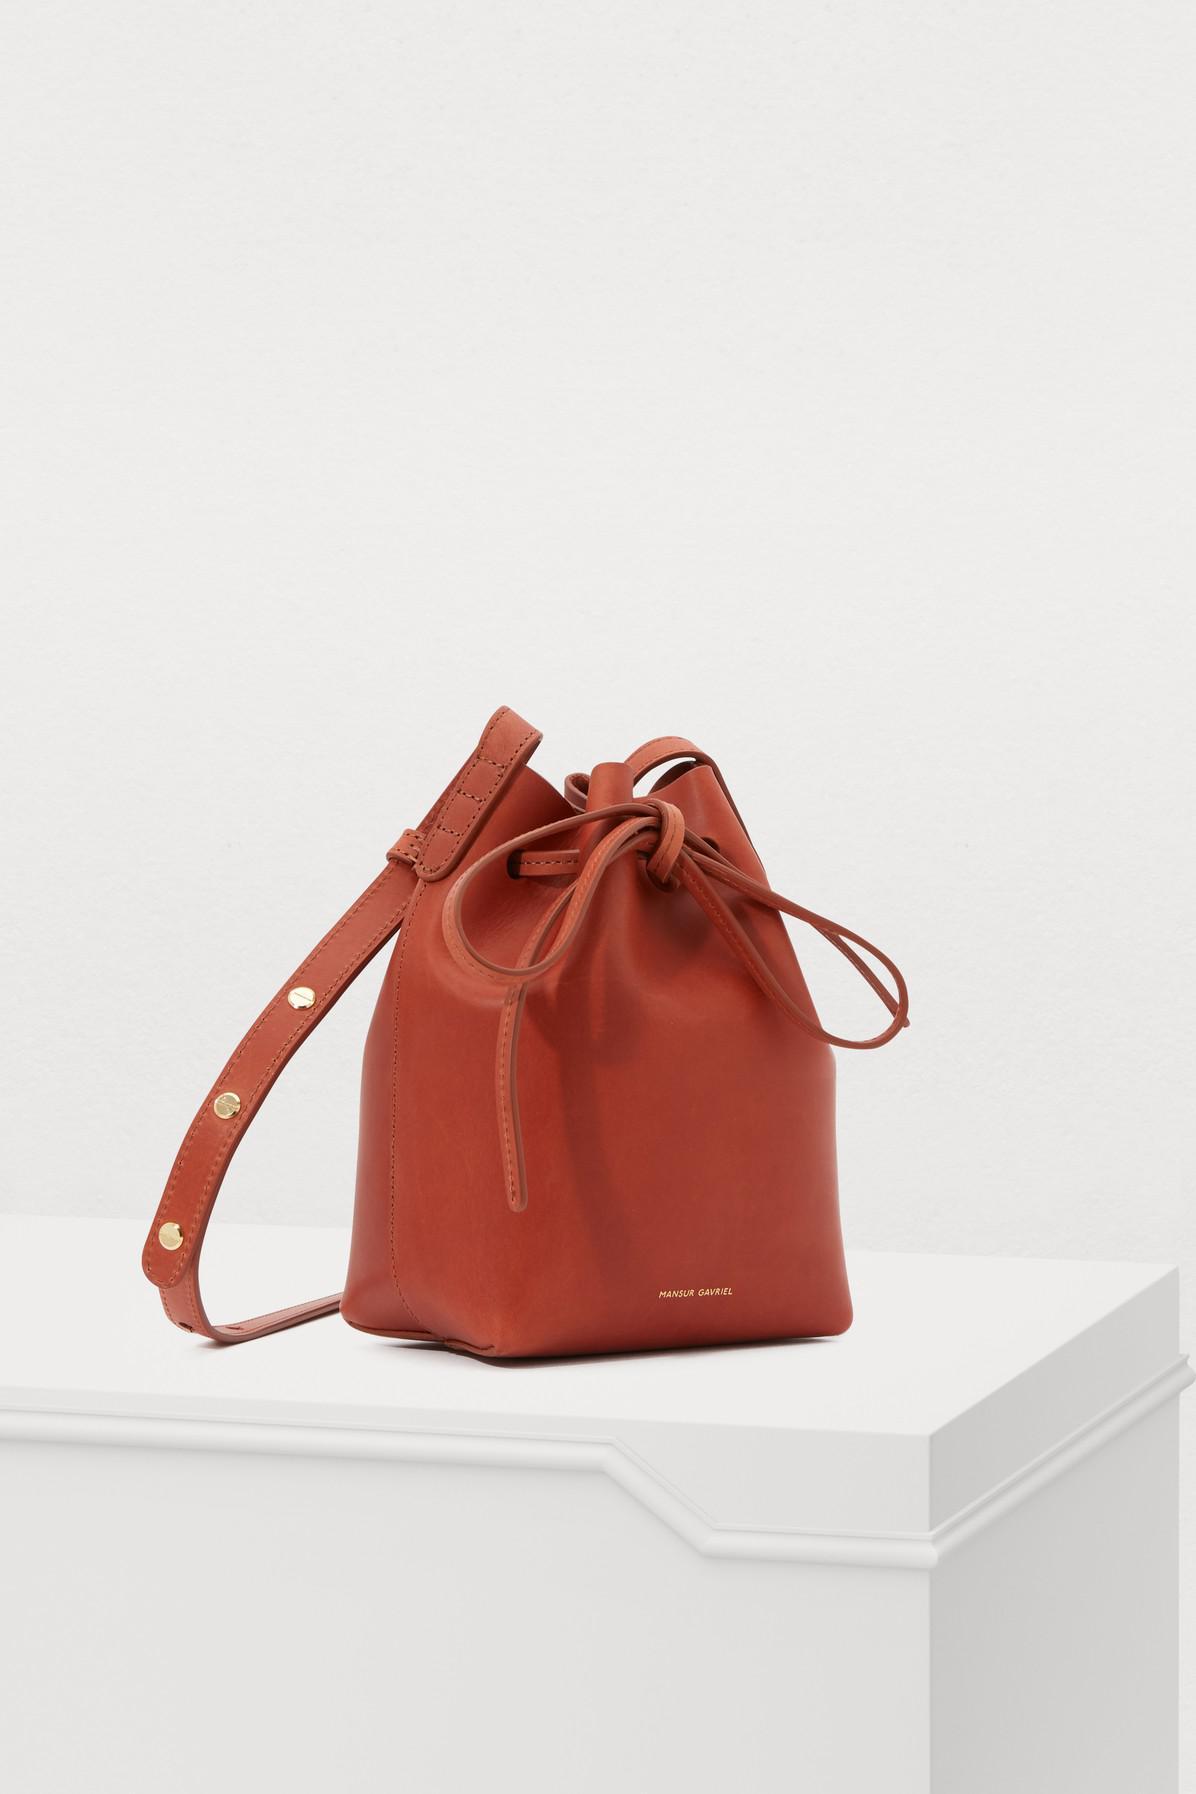 66997edfa003e Mansur Gavriel - Red Vegetable-tanned Leather Mini Bucket Bag - Lyst. View  fullscreen